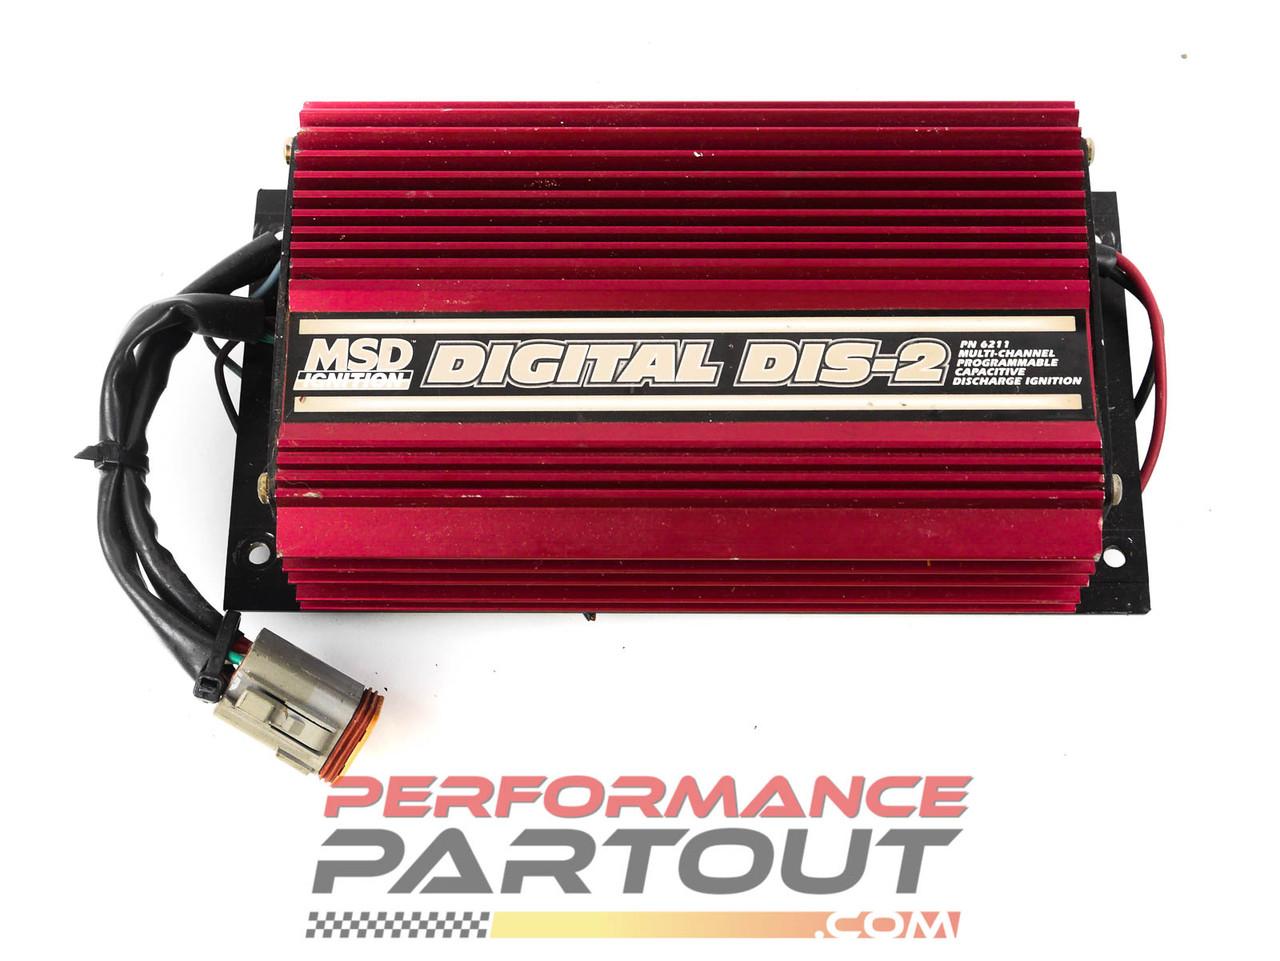 MSD DIS2 ignition box